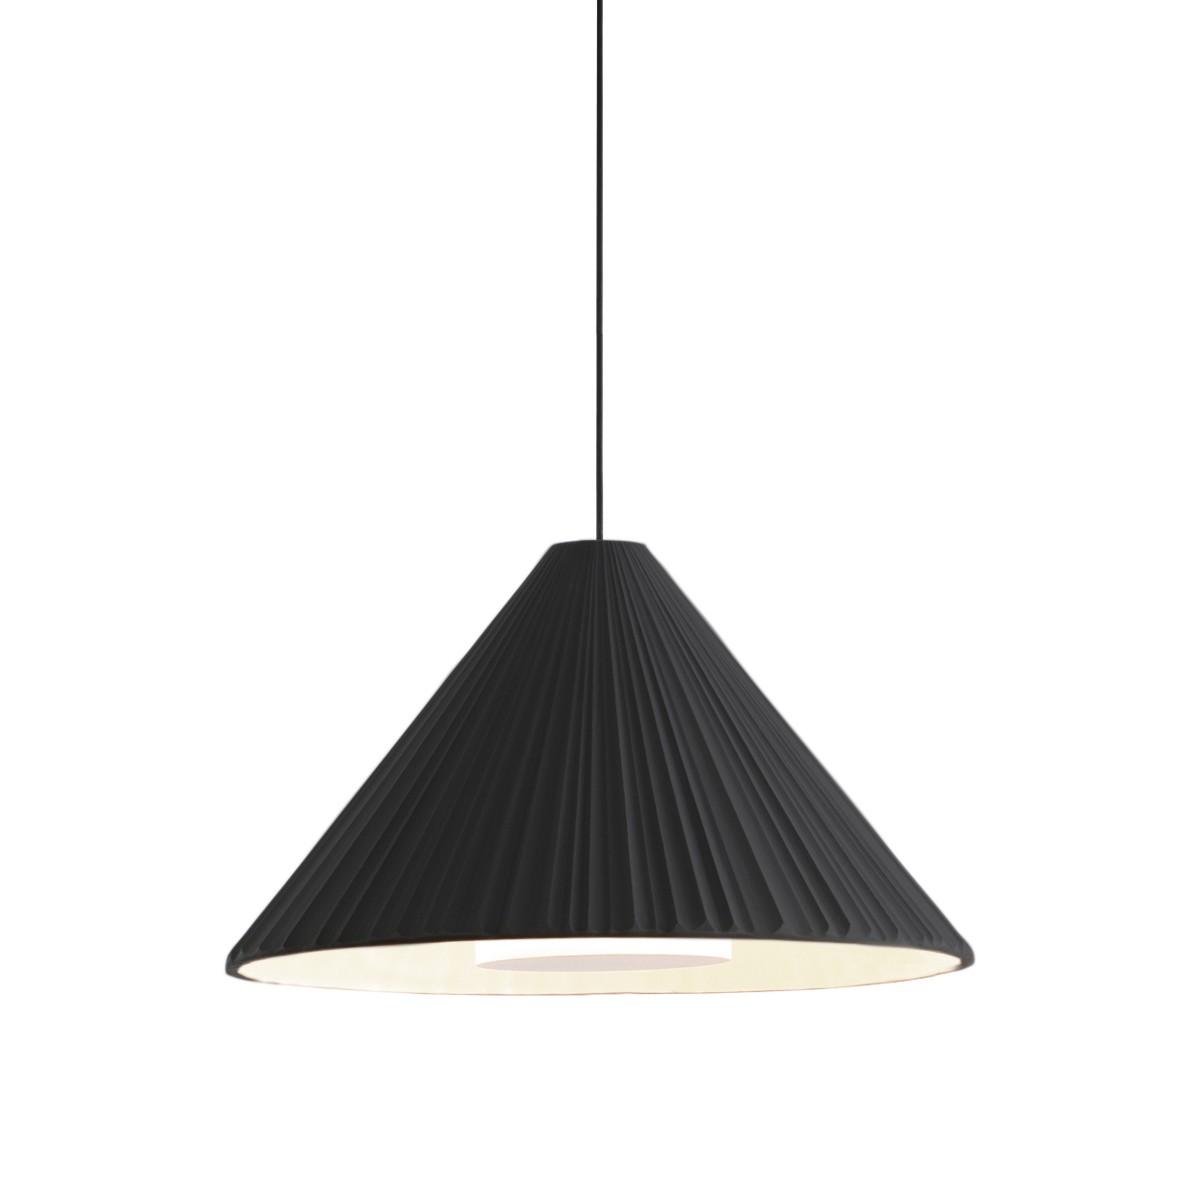 Pu-Ehr Lámpara colgante 21 LED 4W Negro -Blanco